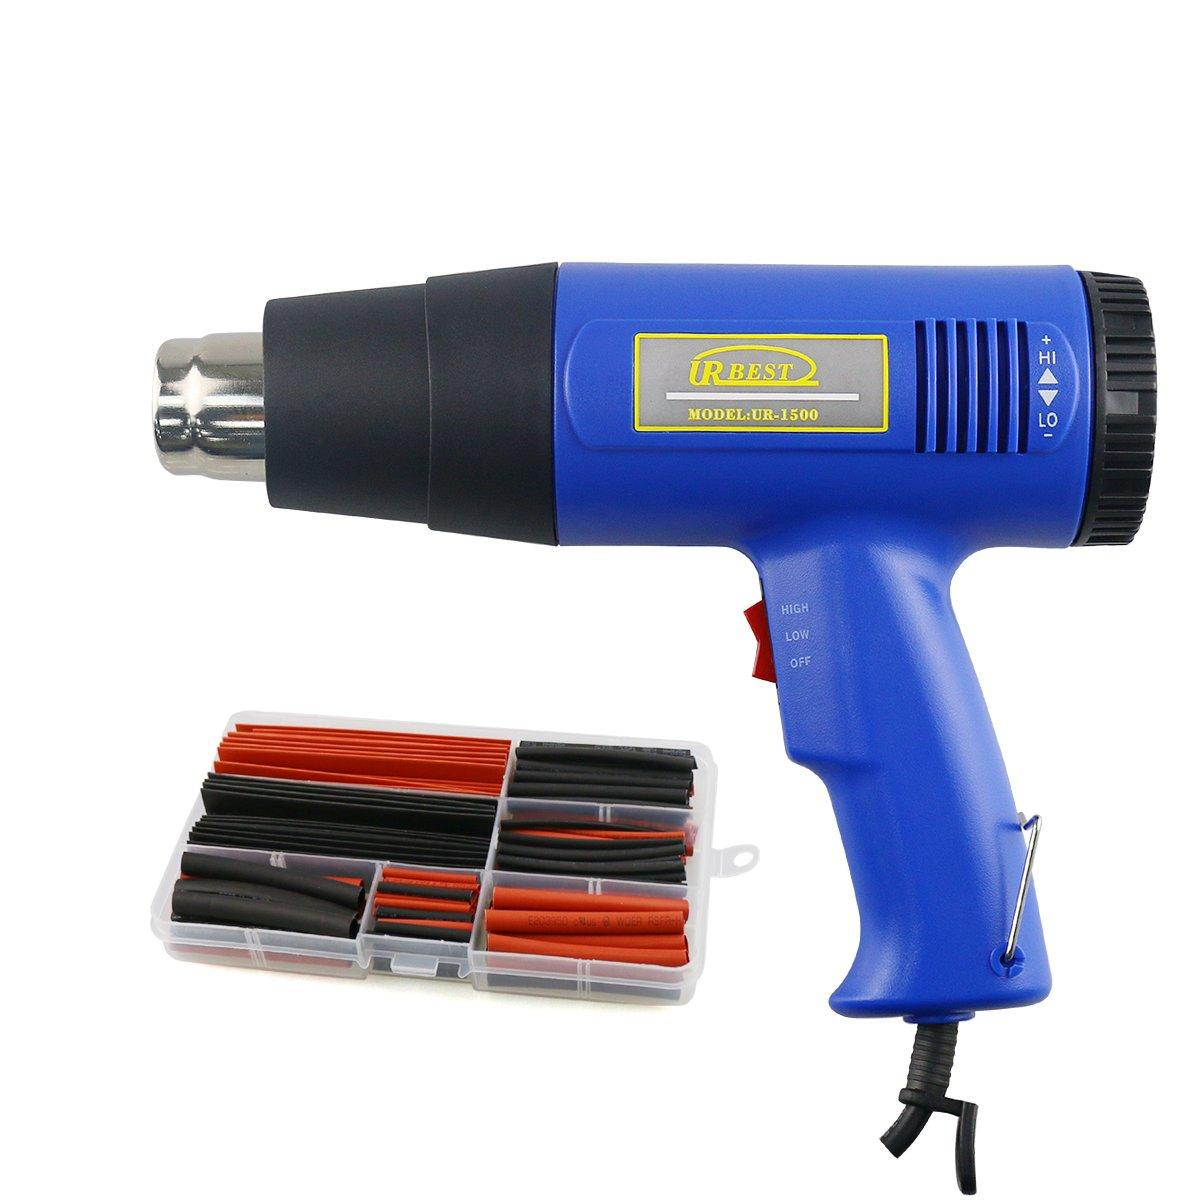 URBEST Heat Gun kit Fast Heating 1500W Hot Air Blower with 150Pcs 8 Various Heat Shrink Tubing